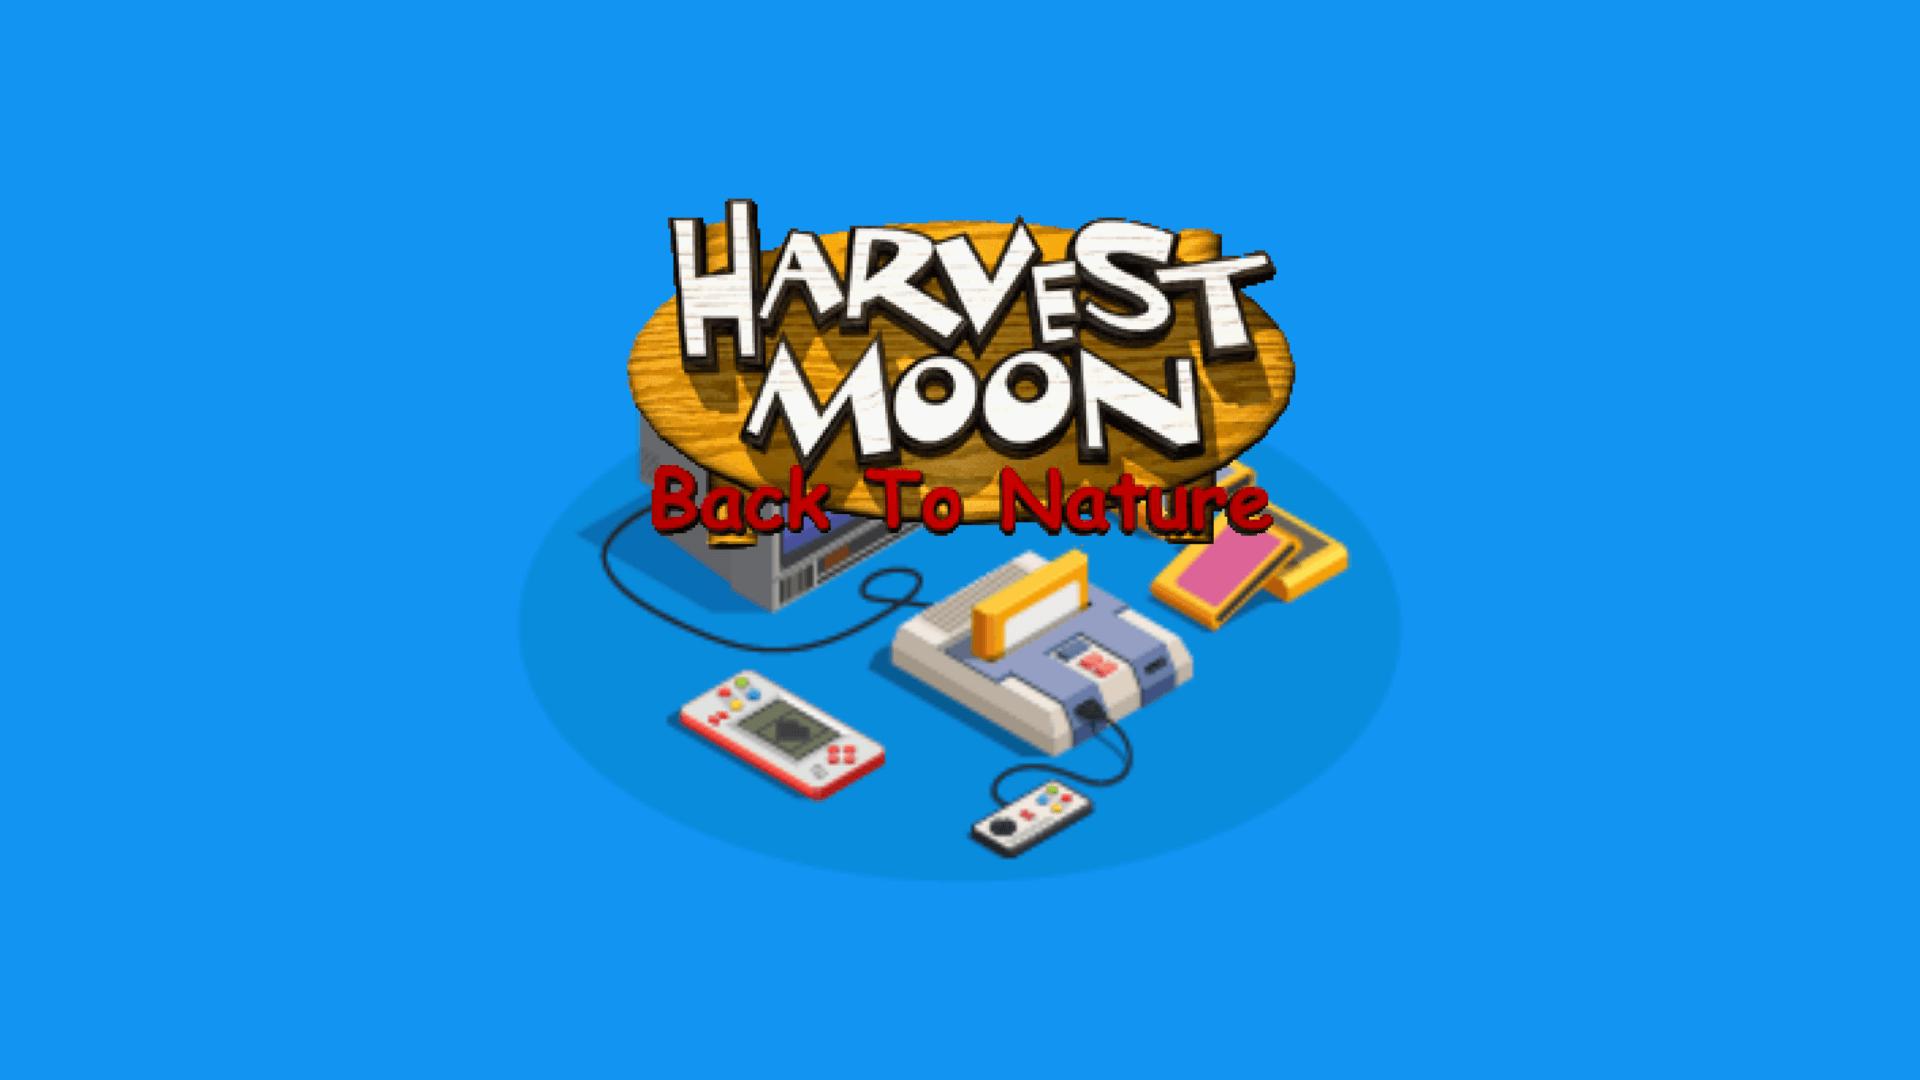 Cara-Install-Aplikasi-Game-Harvest-Moon-Back-to-Nature-Android